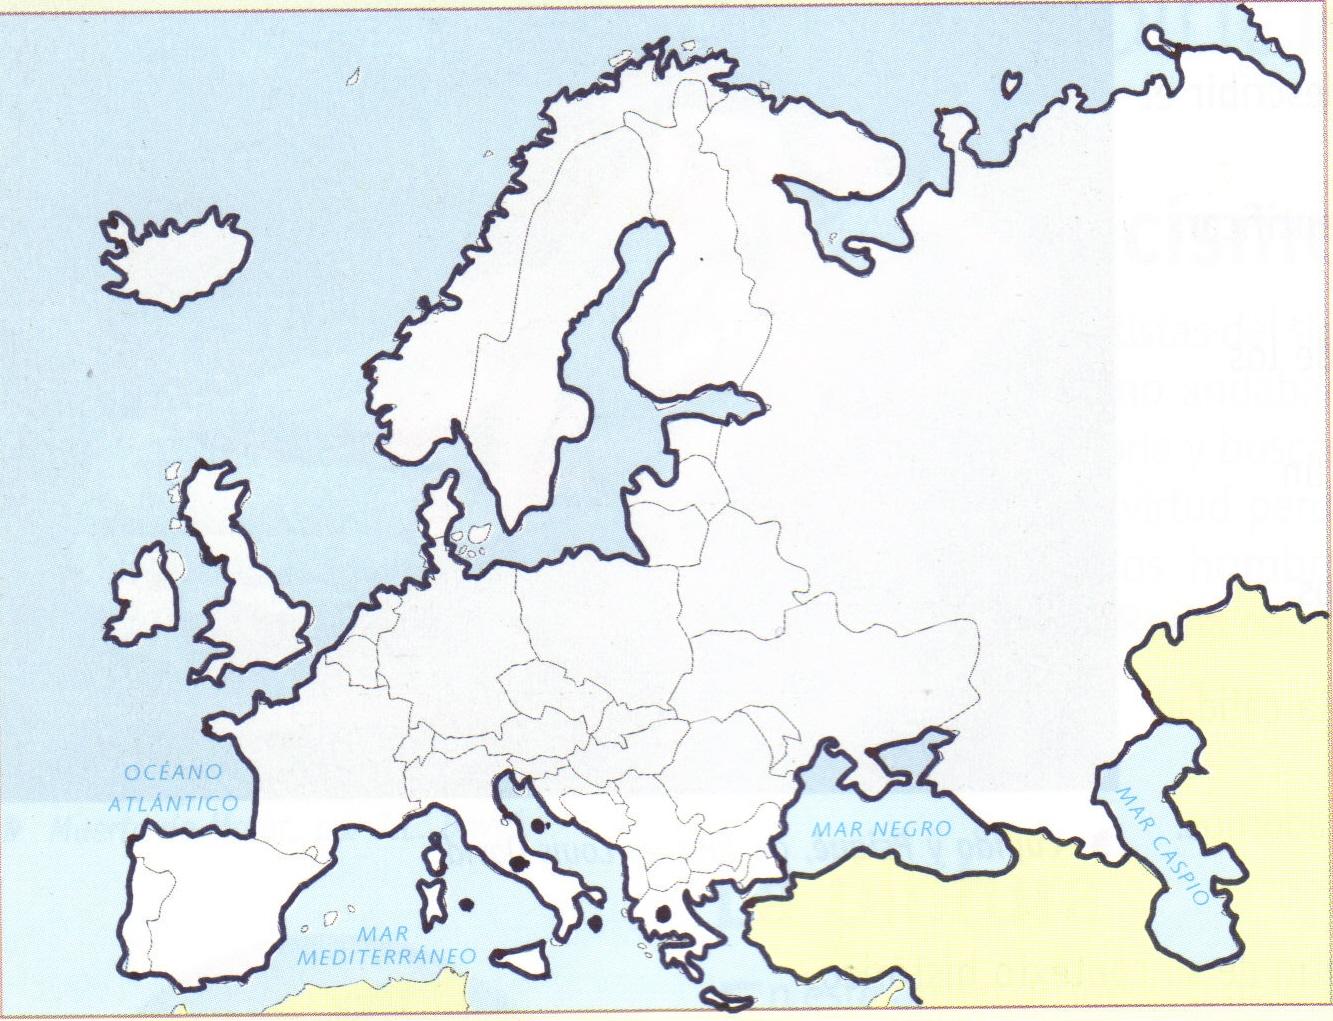 CIVILIZACIÓN DE GRECIA: CIVILIZACIÓN DE GRECIA